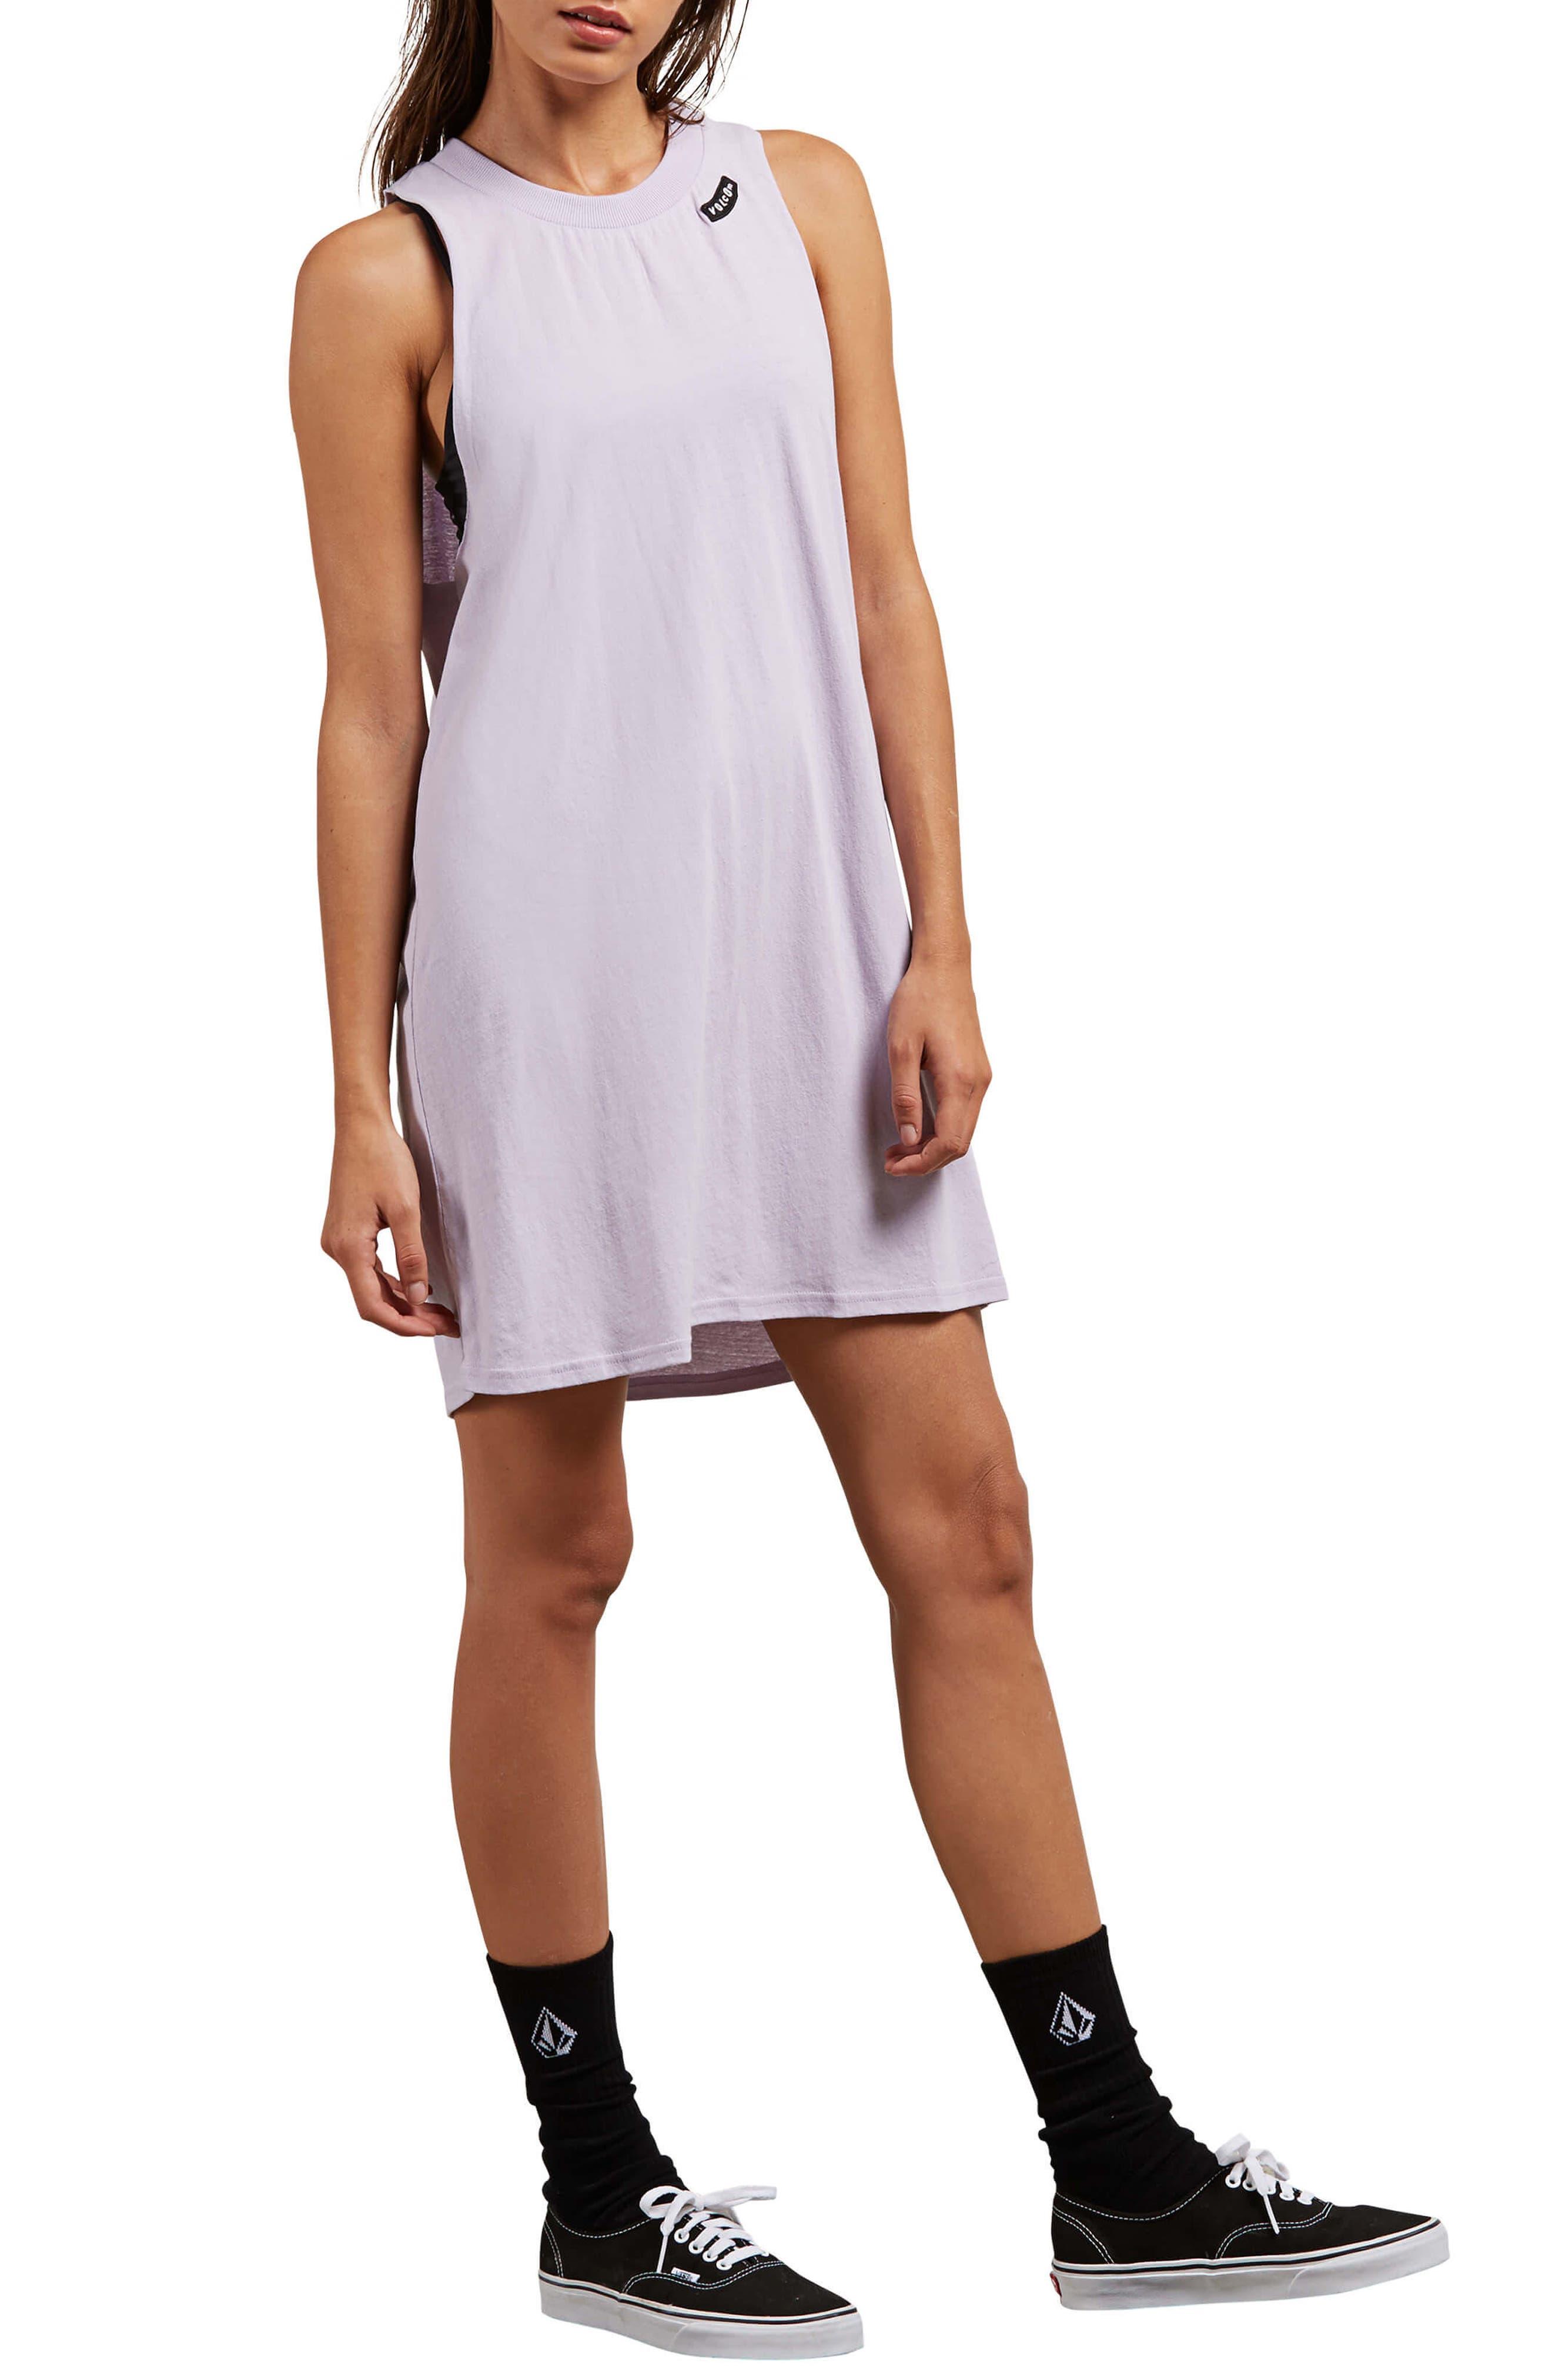 Volcom Day by Day Tank Dress